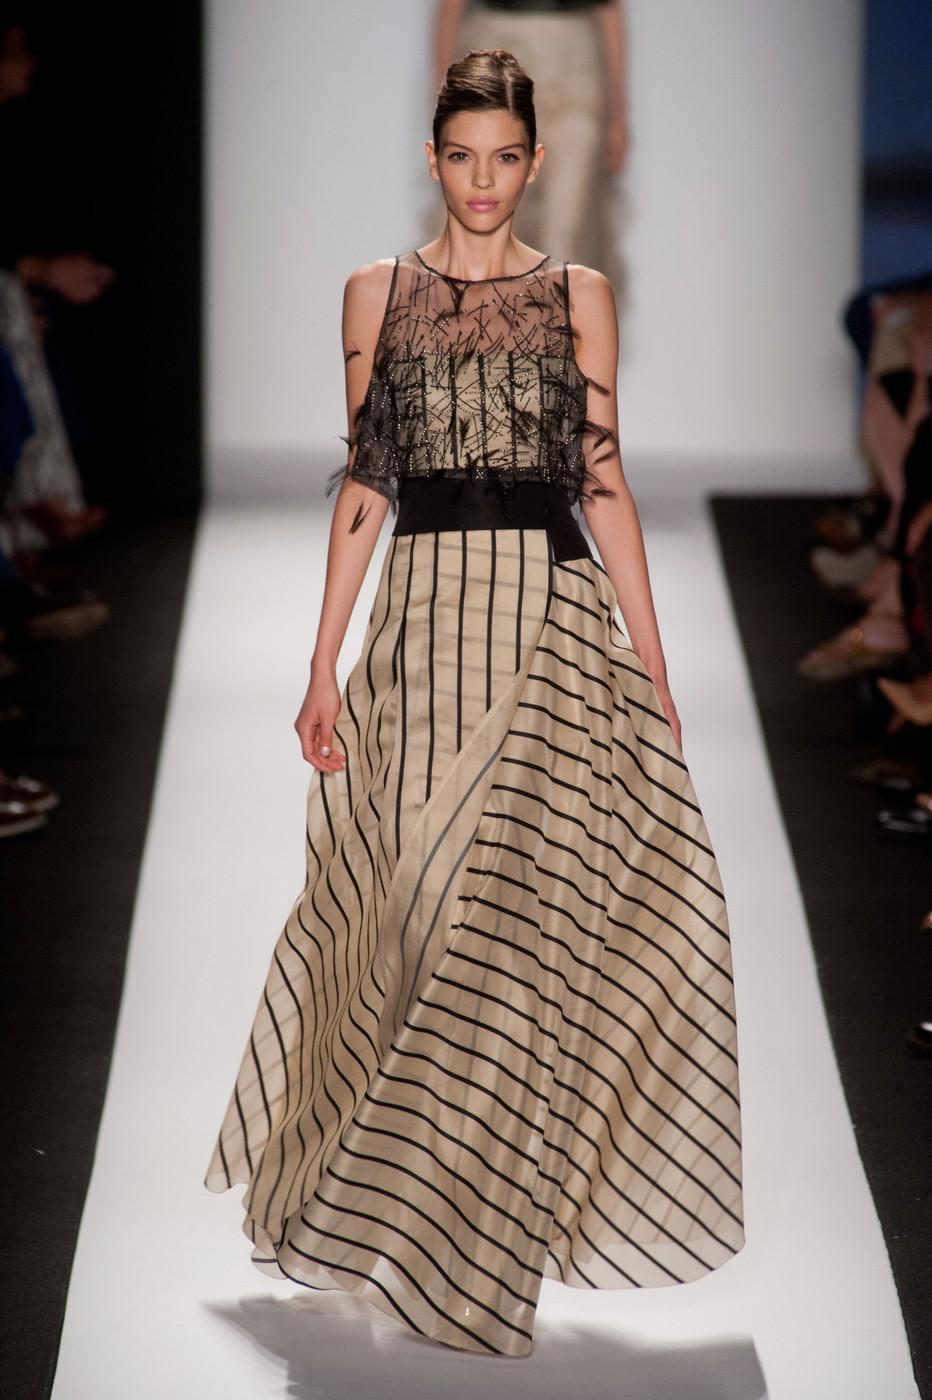 Fashion Dresses Style: NEW YORK FASHION WEEK: CAROLINA HERRERA SPRING 2014